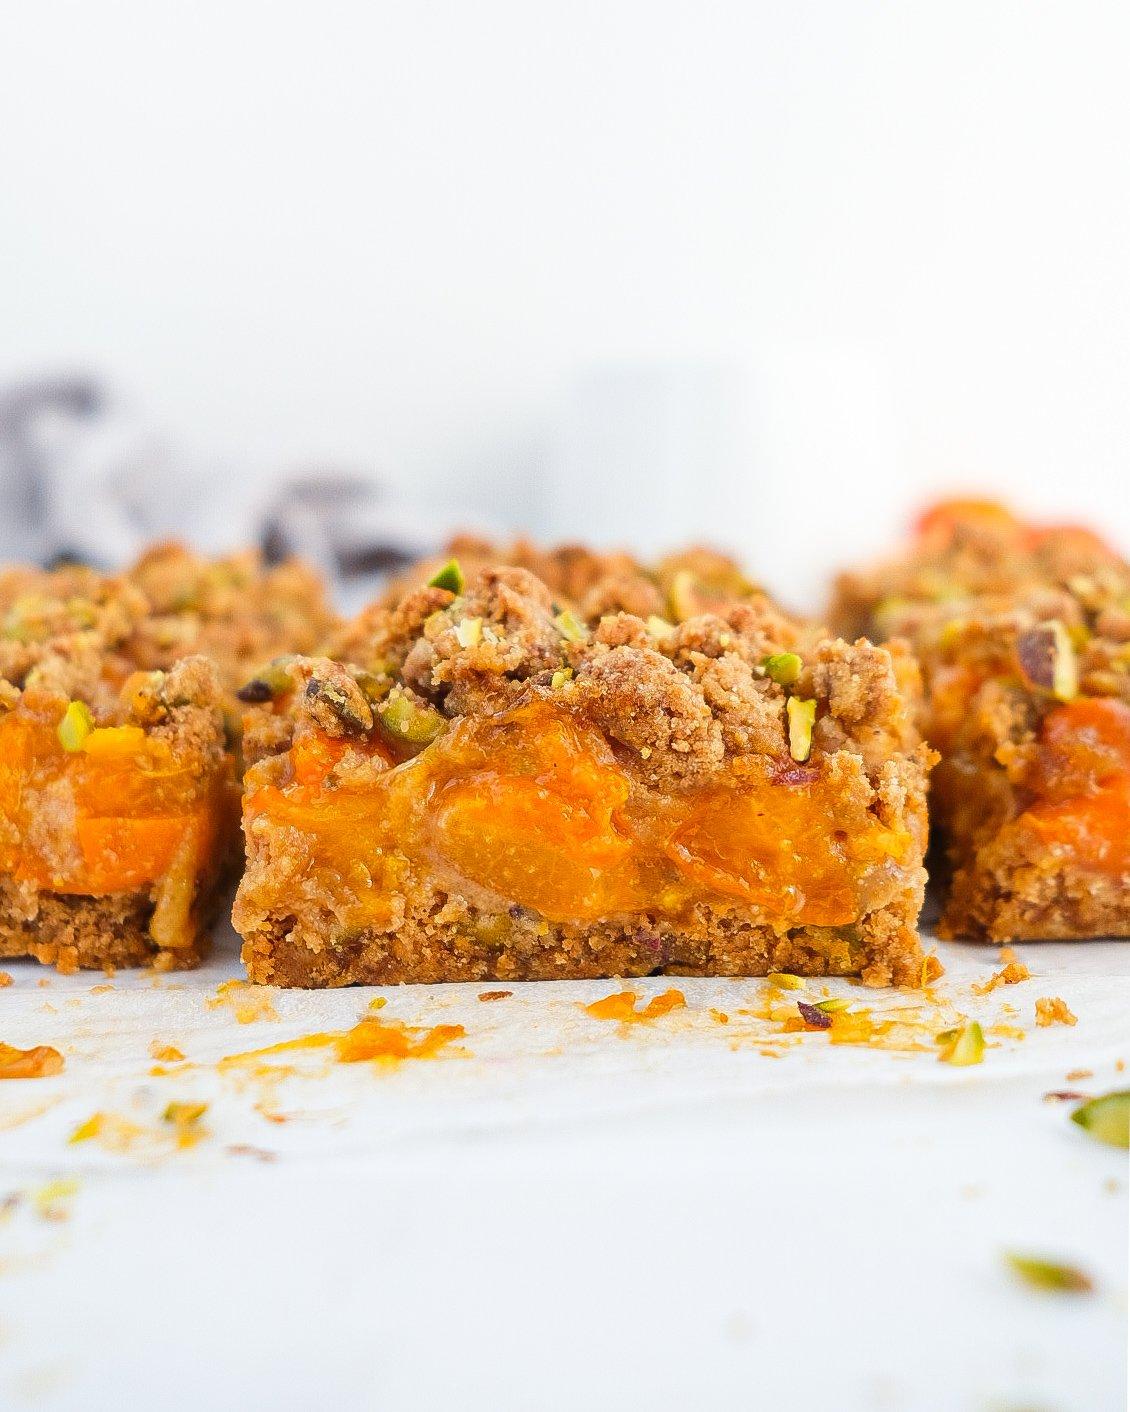 Apricot Pistachio Crumble Bars (paleo)